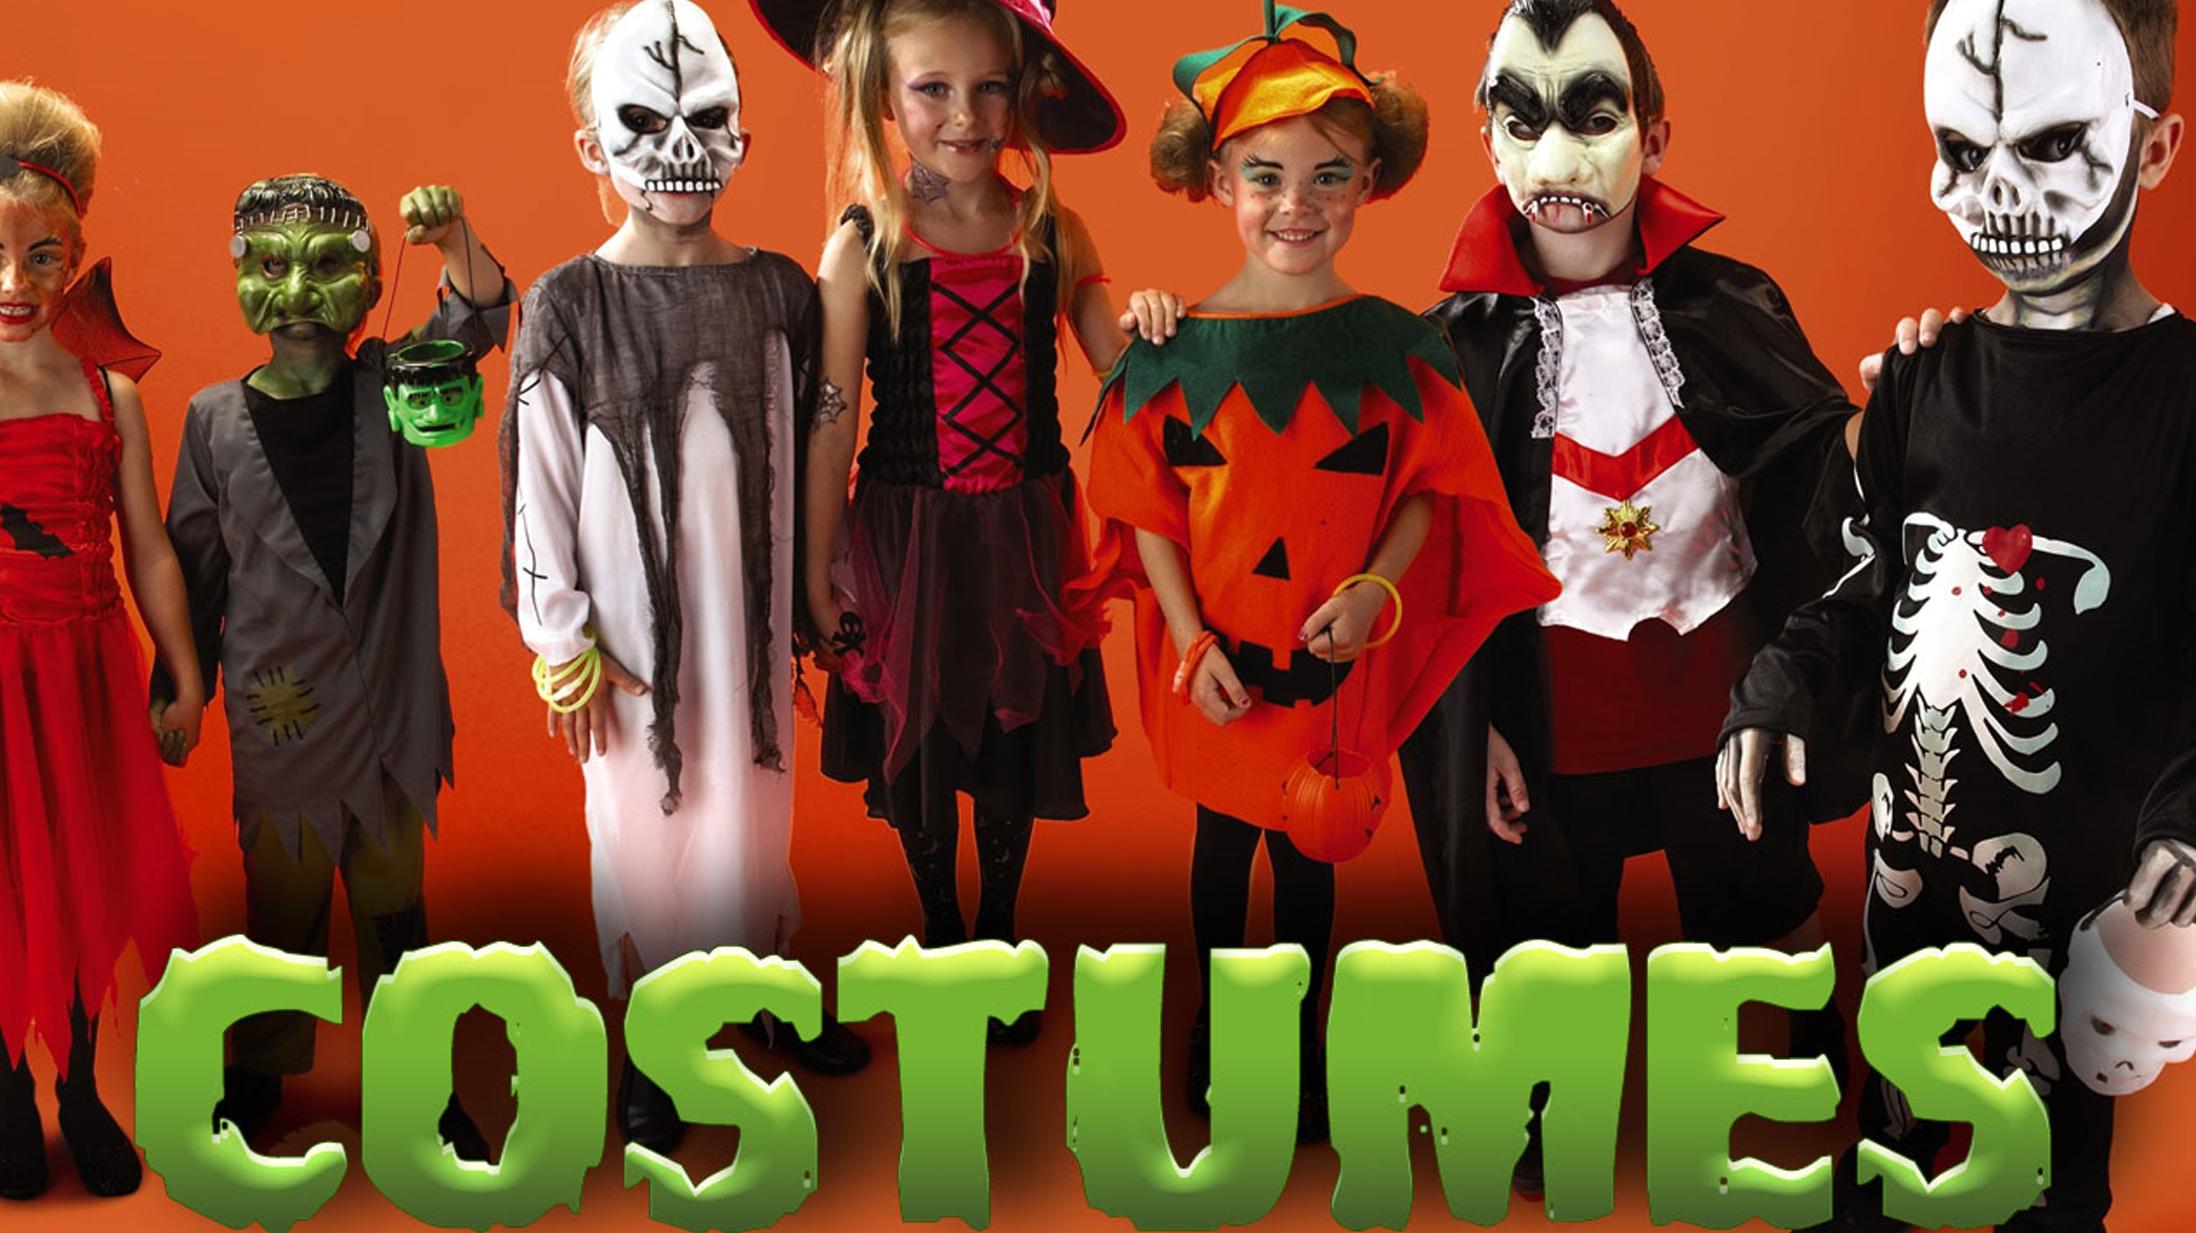 Halloween Costumes 10062015_1445293289468.jpg